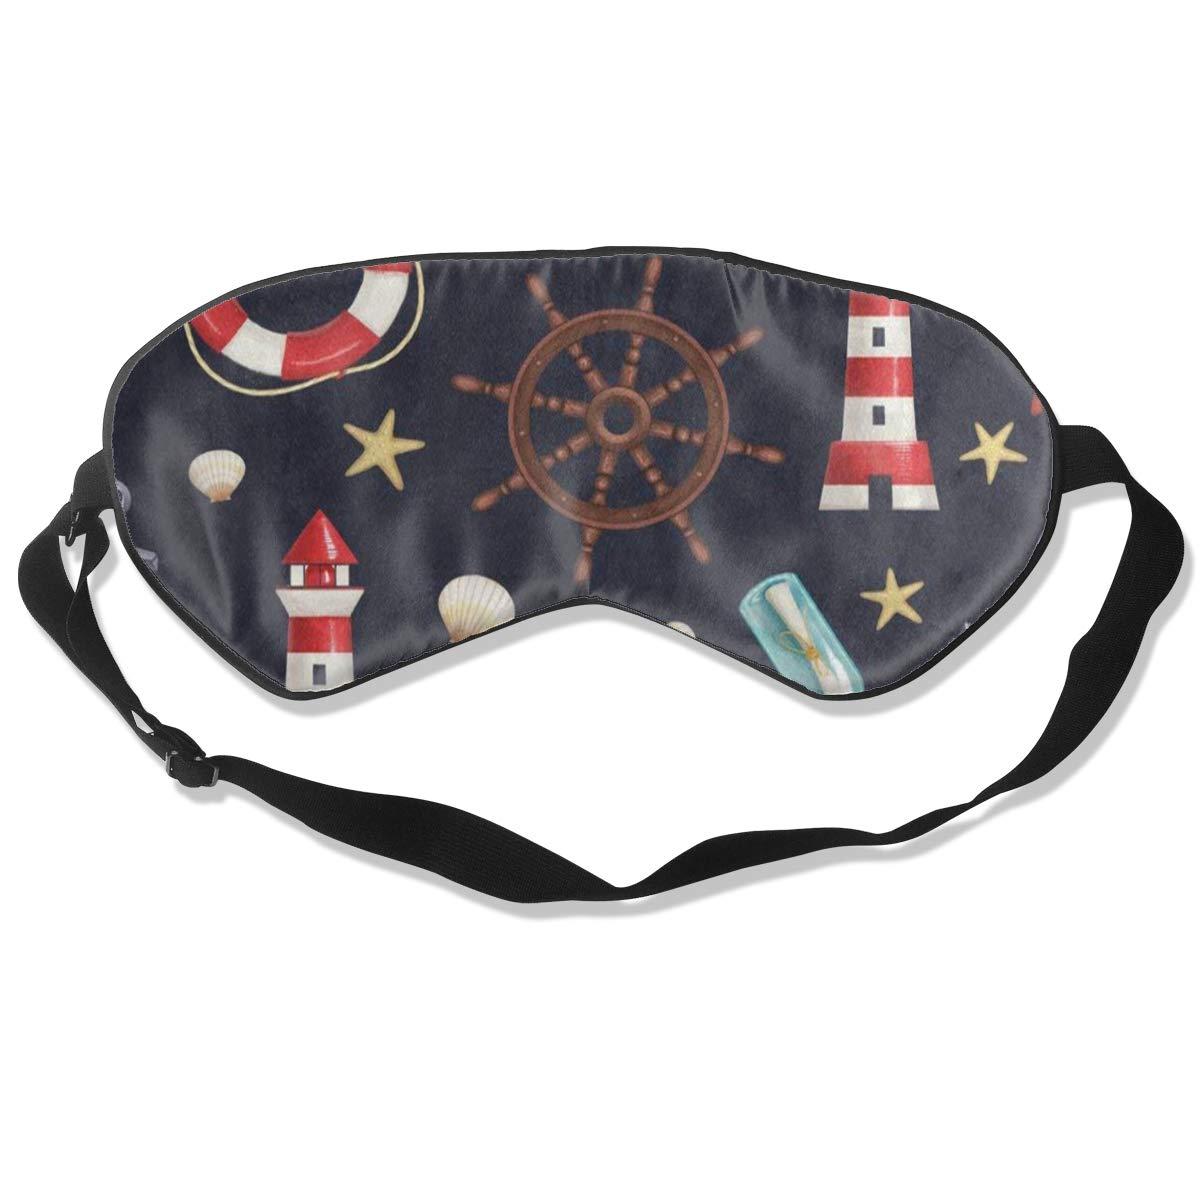 Custom Sleeping Mask Nautical Lighthouse Anchor Starfish Seashell Adjustable Breathable Sleep Mask/Sleeping Eyes Mask/Sleep Eyes Mask/Eyeshade/Blindfold